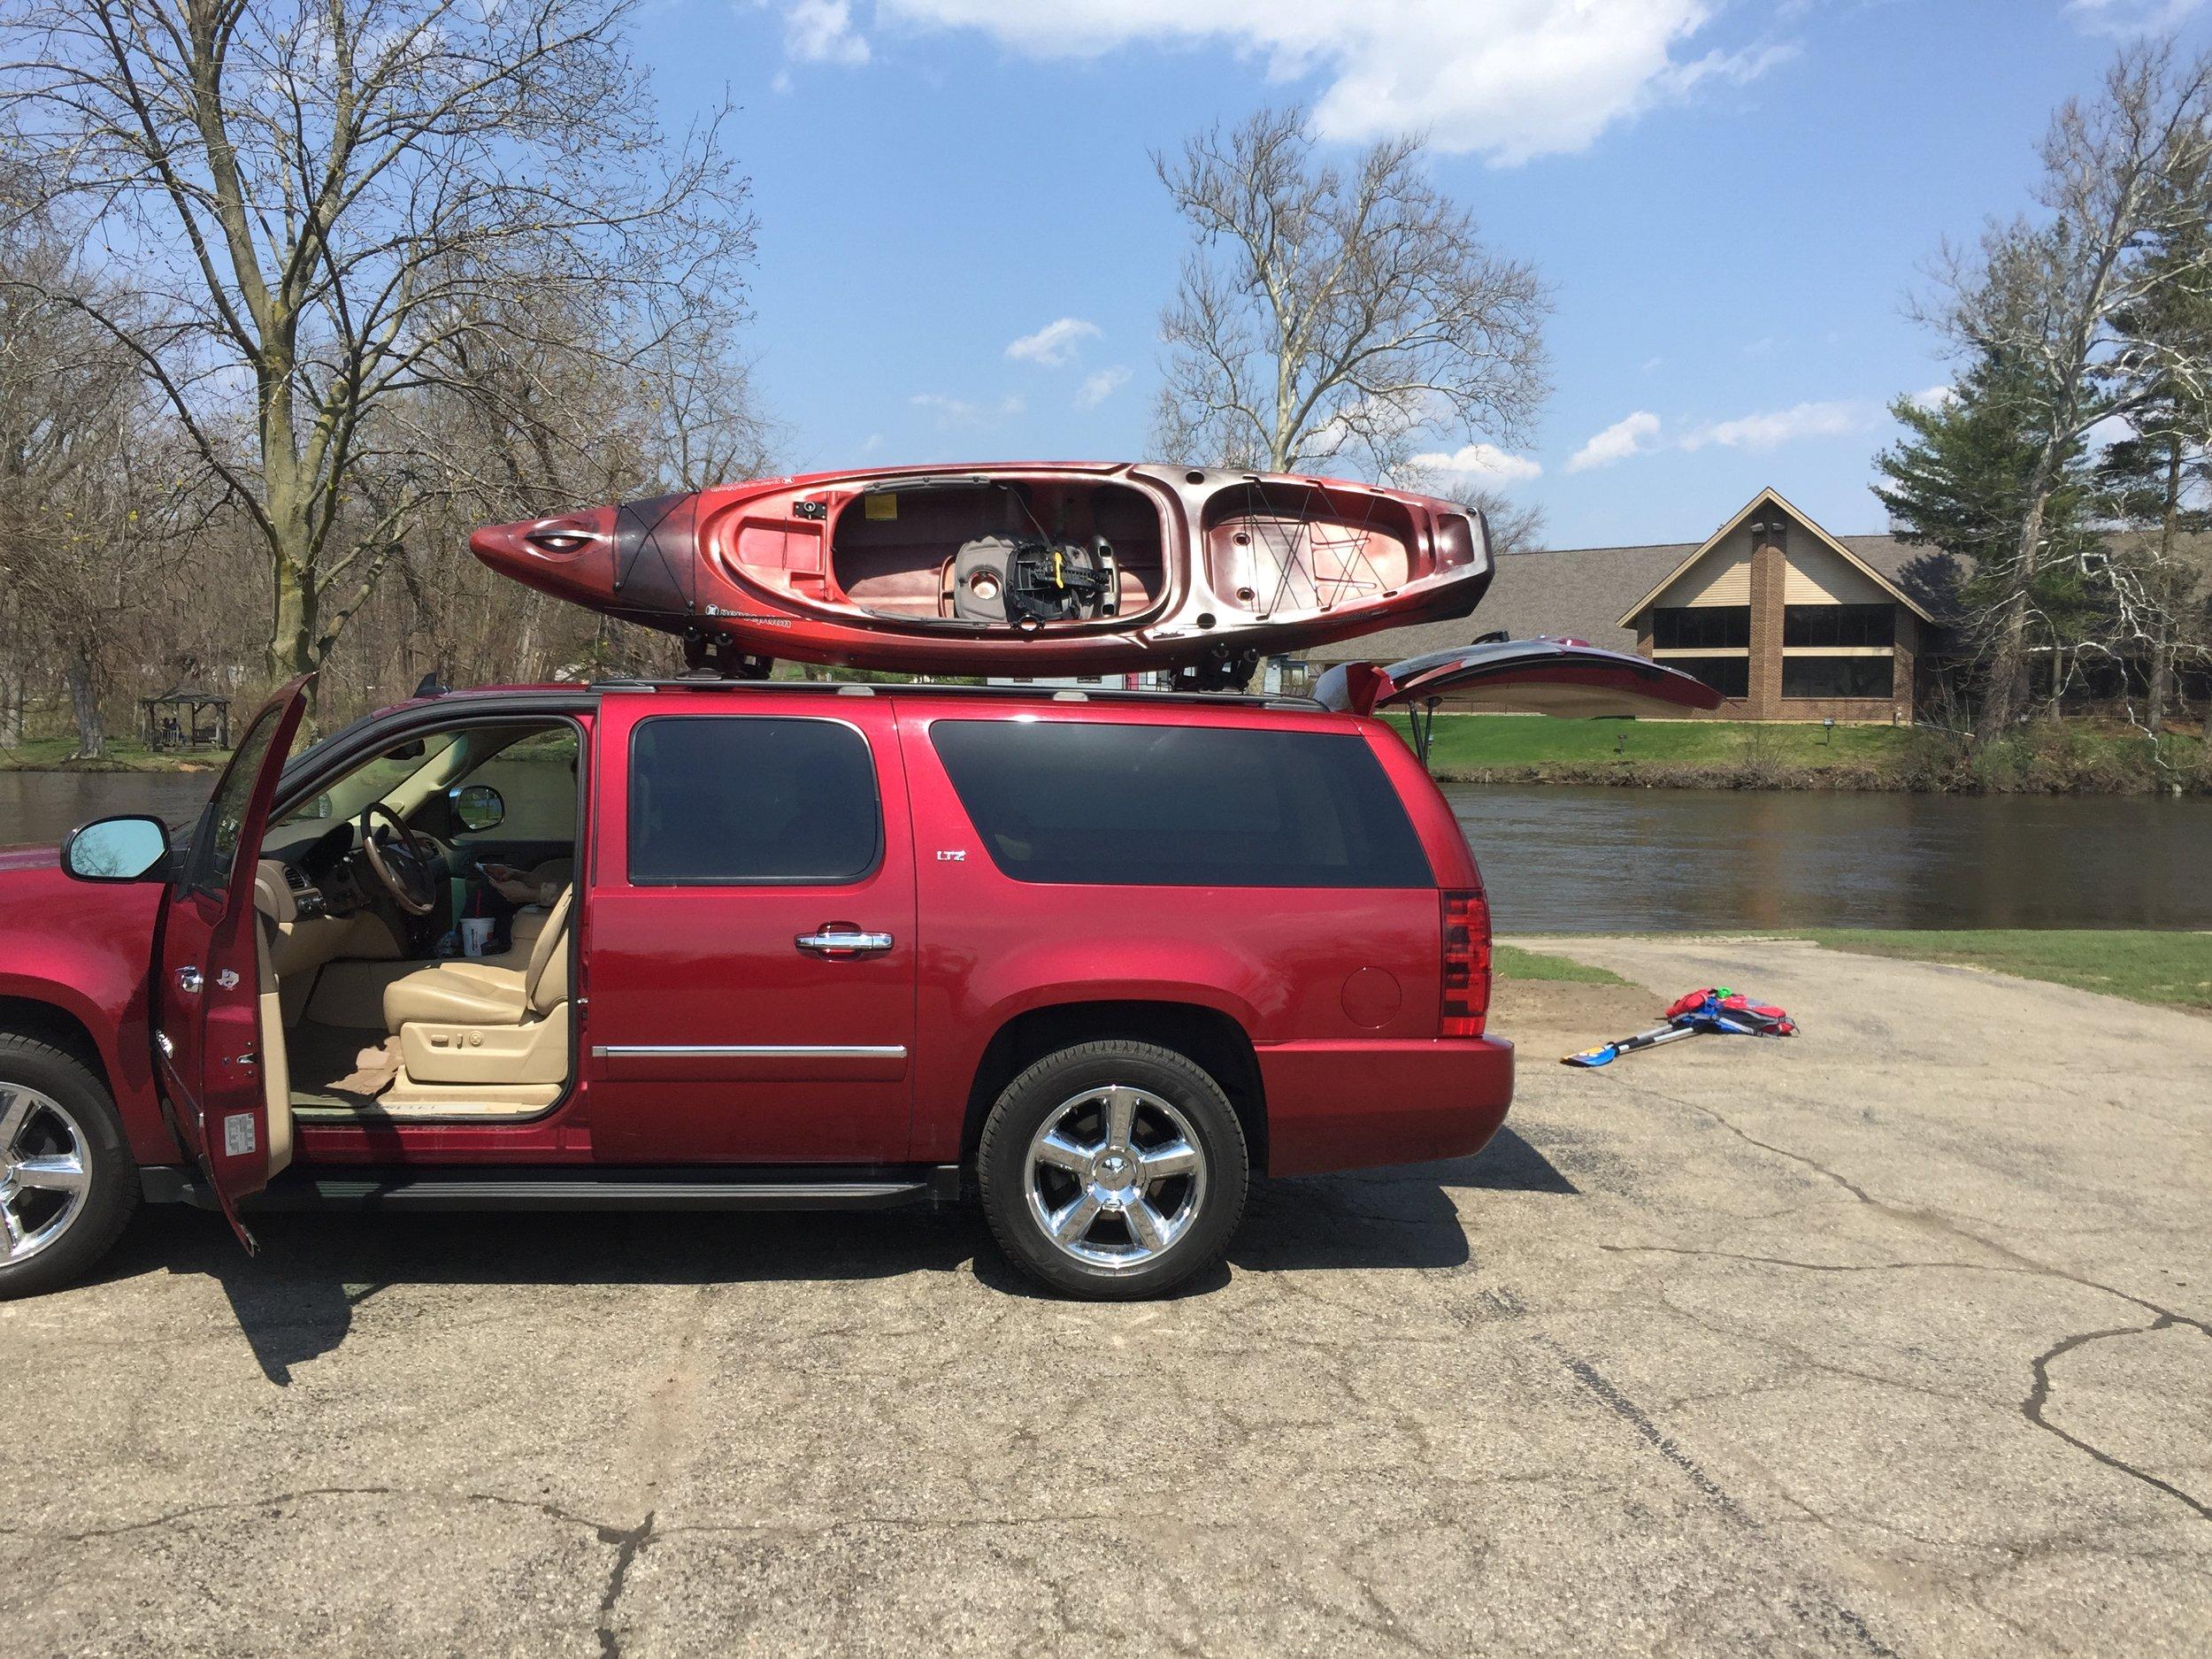 Kayak Adventure — The Kalamazoo House